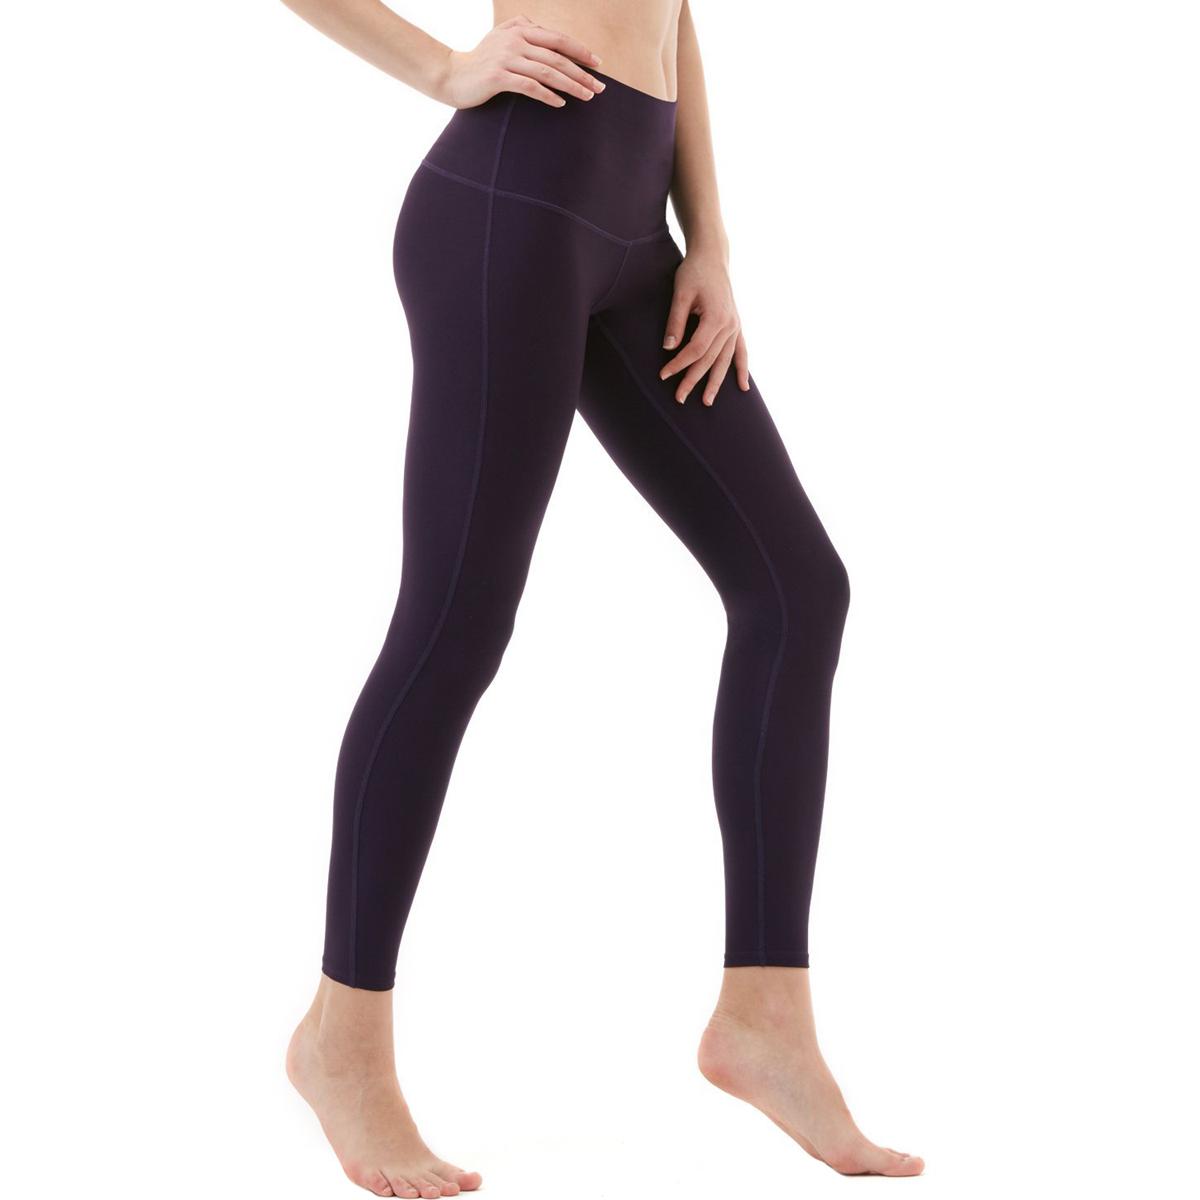 thumbnail 30 - TSLA Tesla FYP42 Women's High-Waisted Ultra-Stretch Tummy Control Yoga Pants